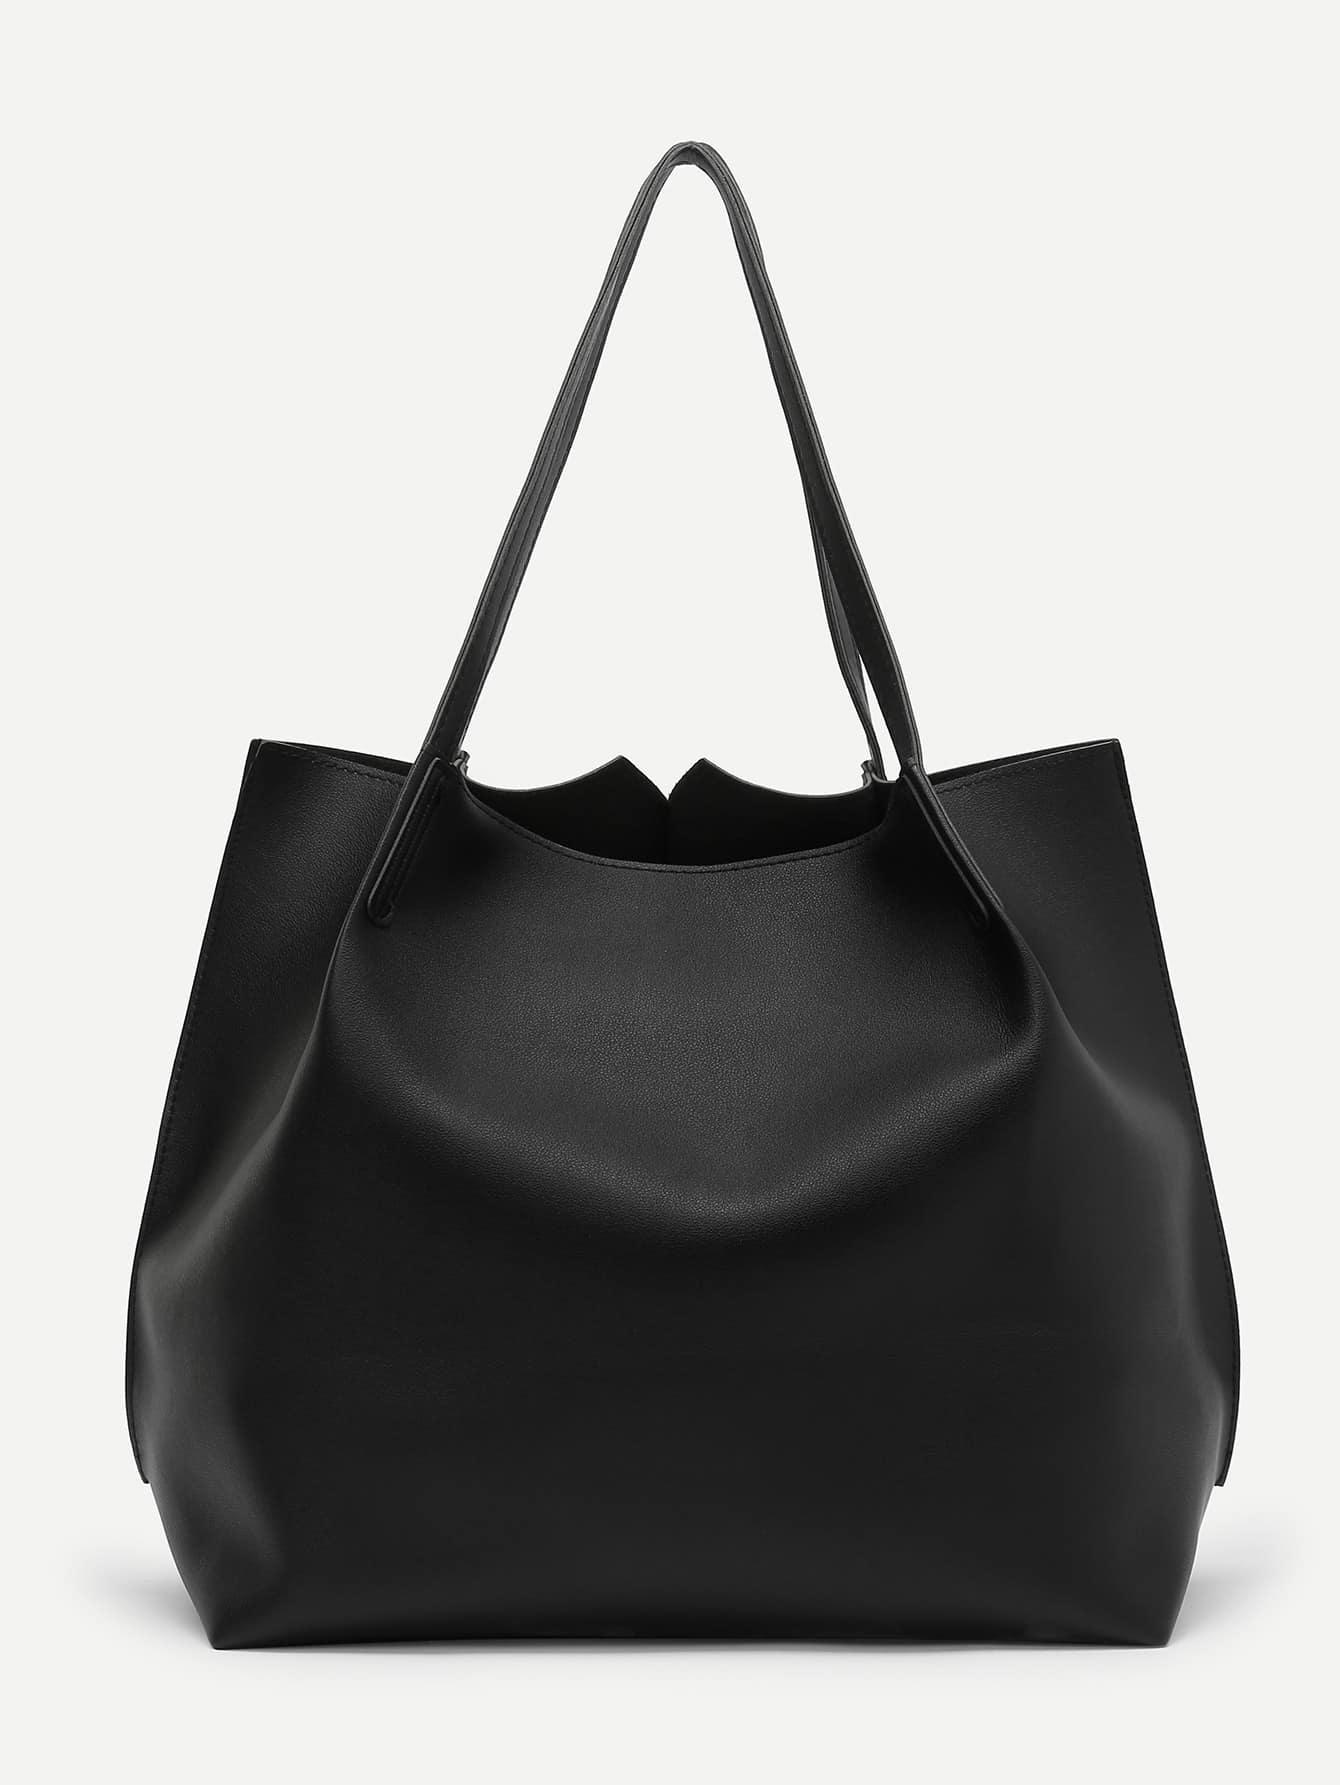 Pom Pom Charm Tote Bag With Clutch tote bag with round charm